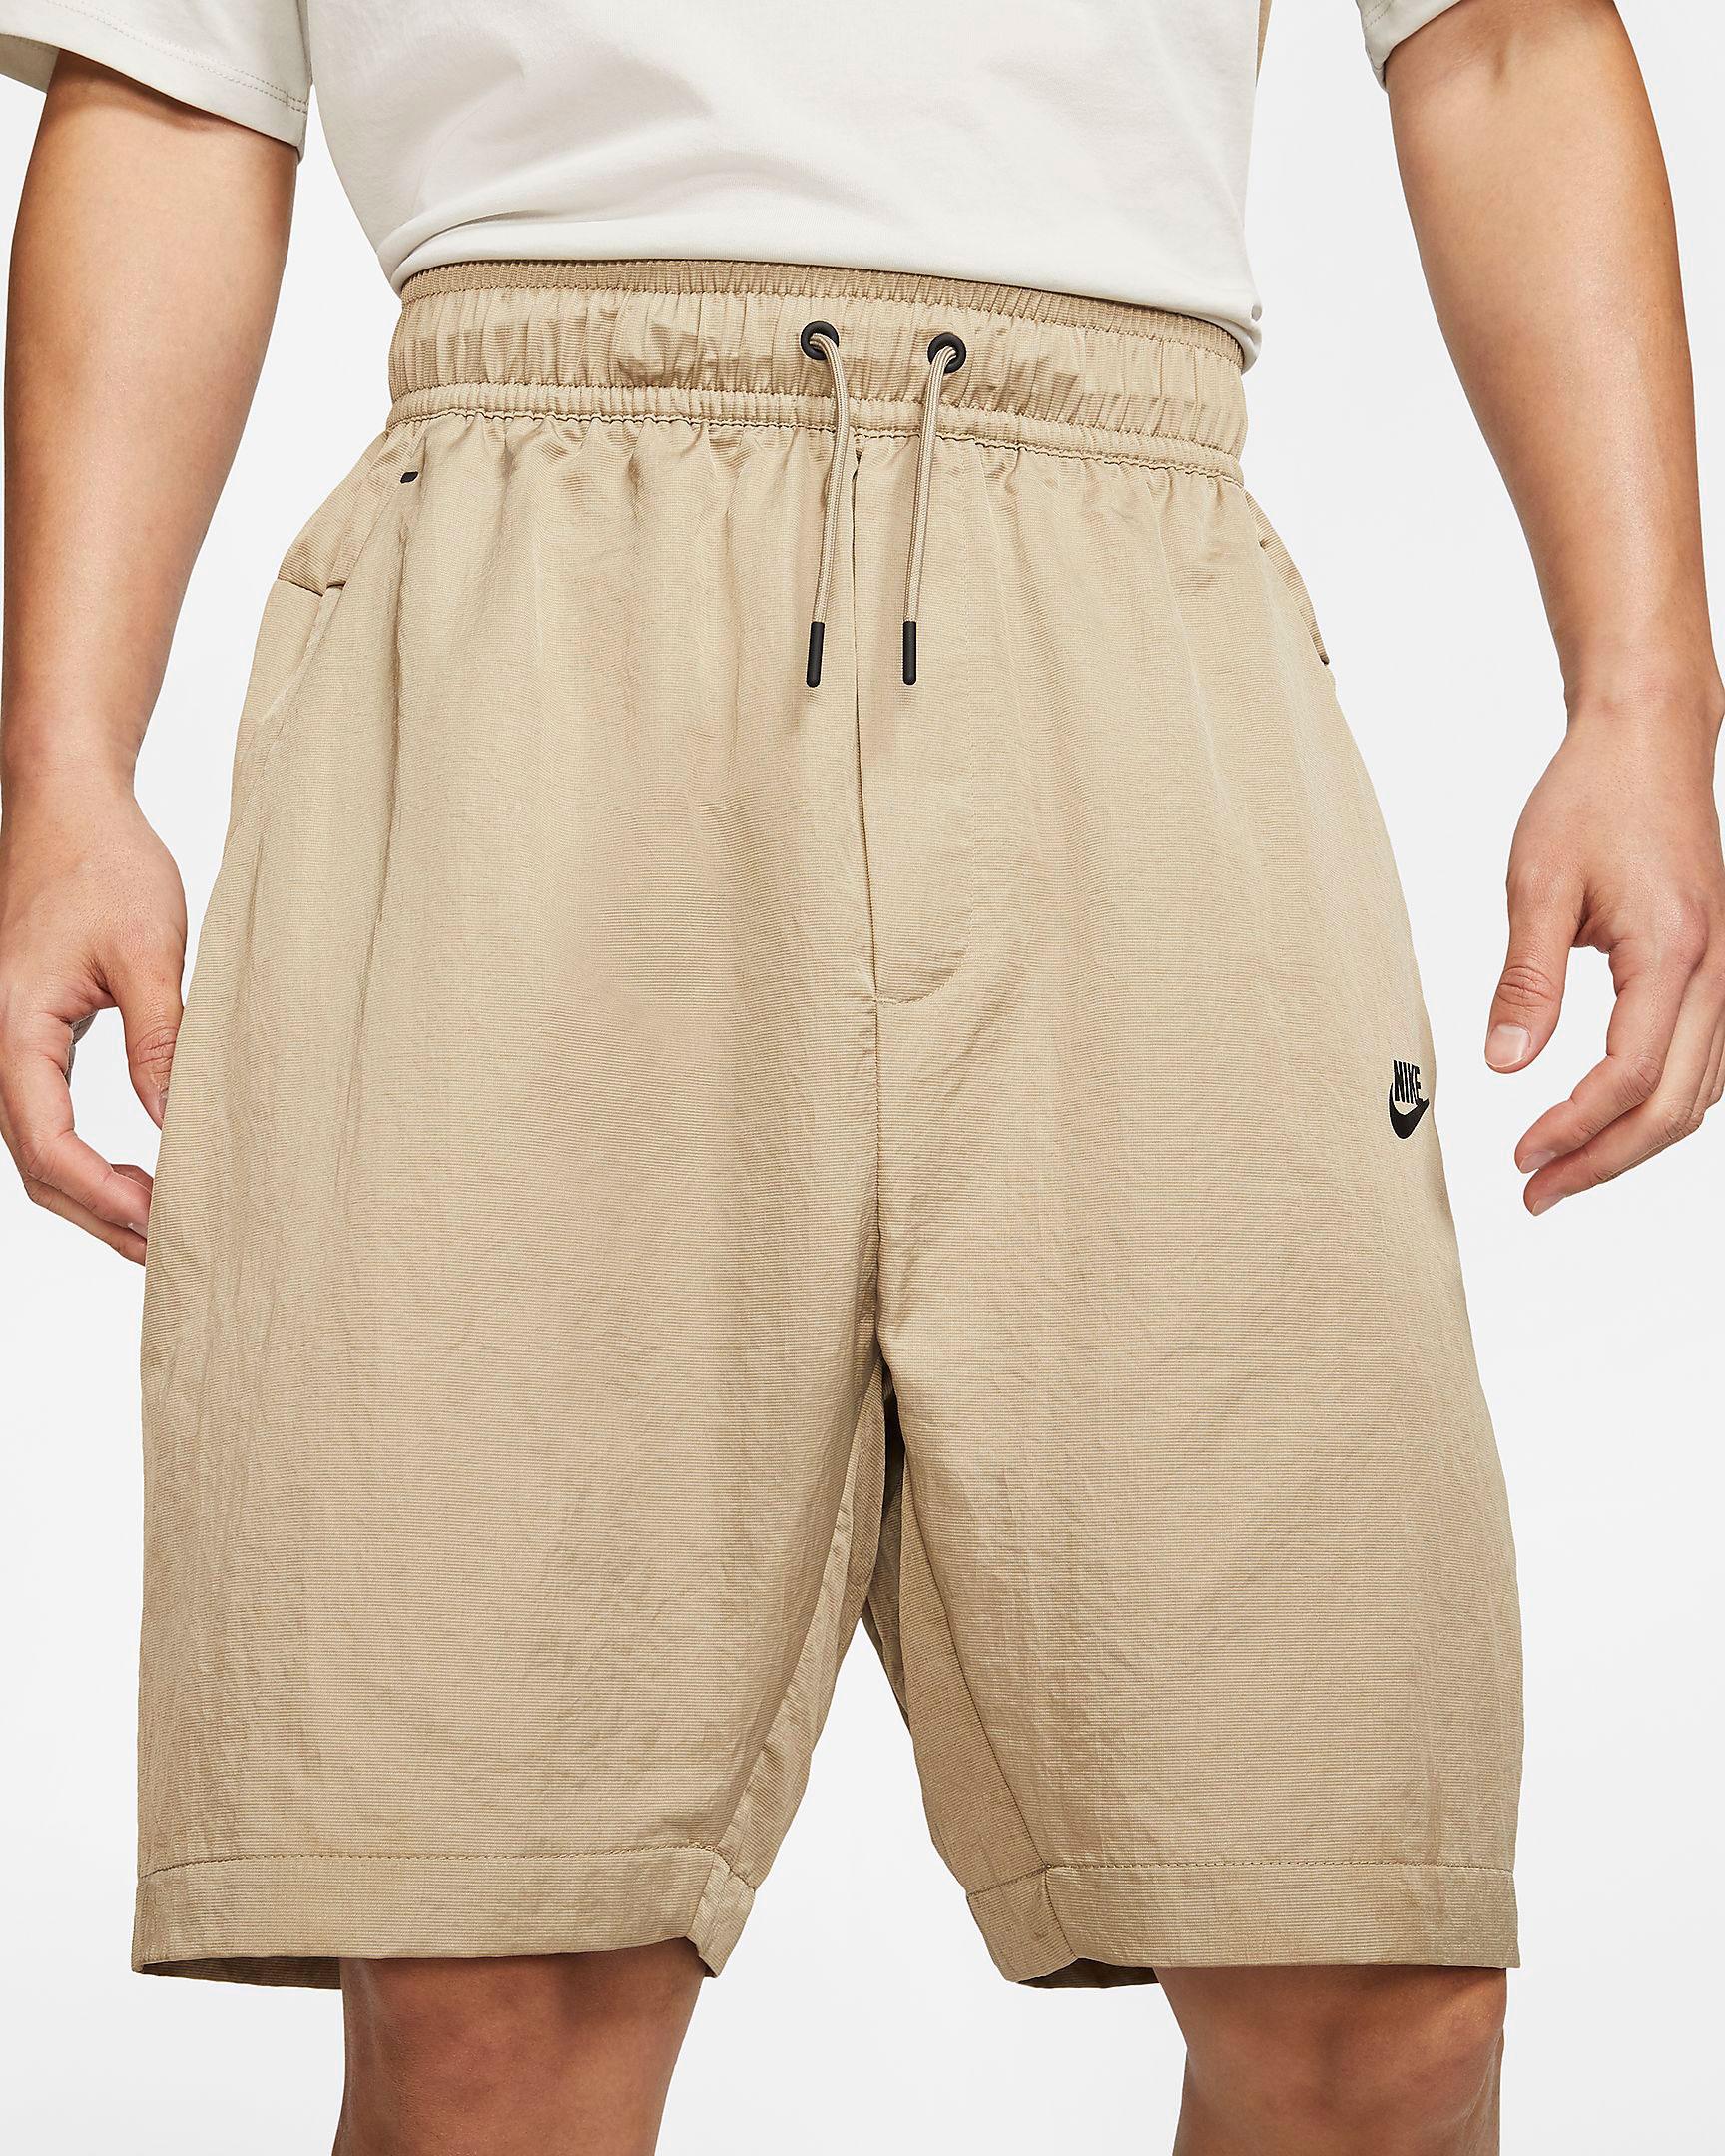 nike-sportswear-khaki-shorts